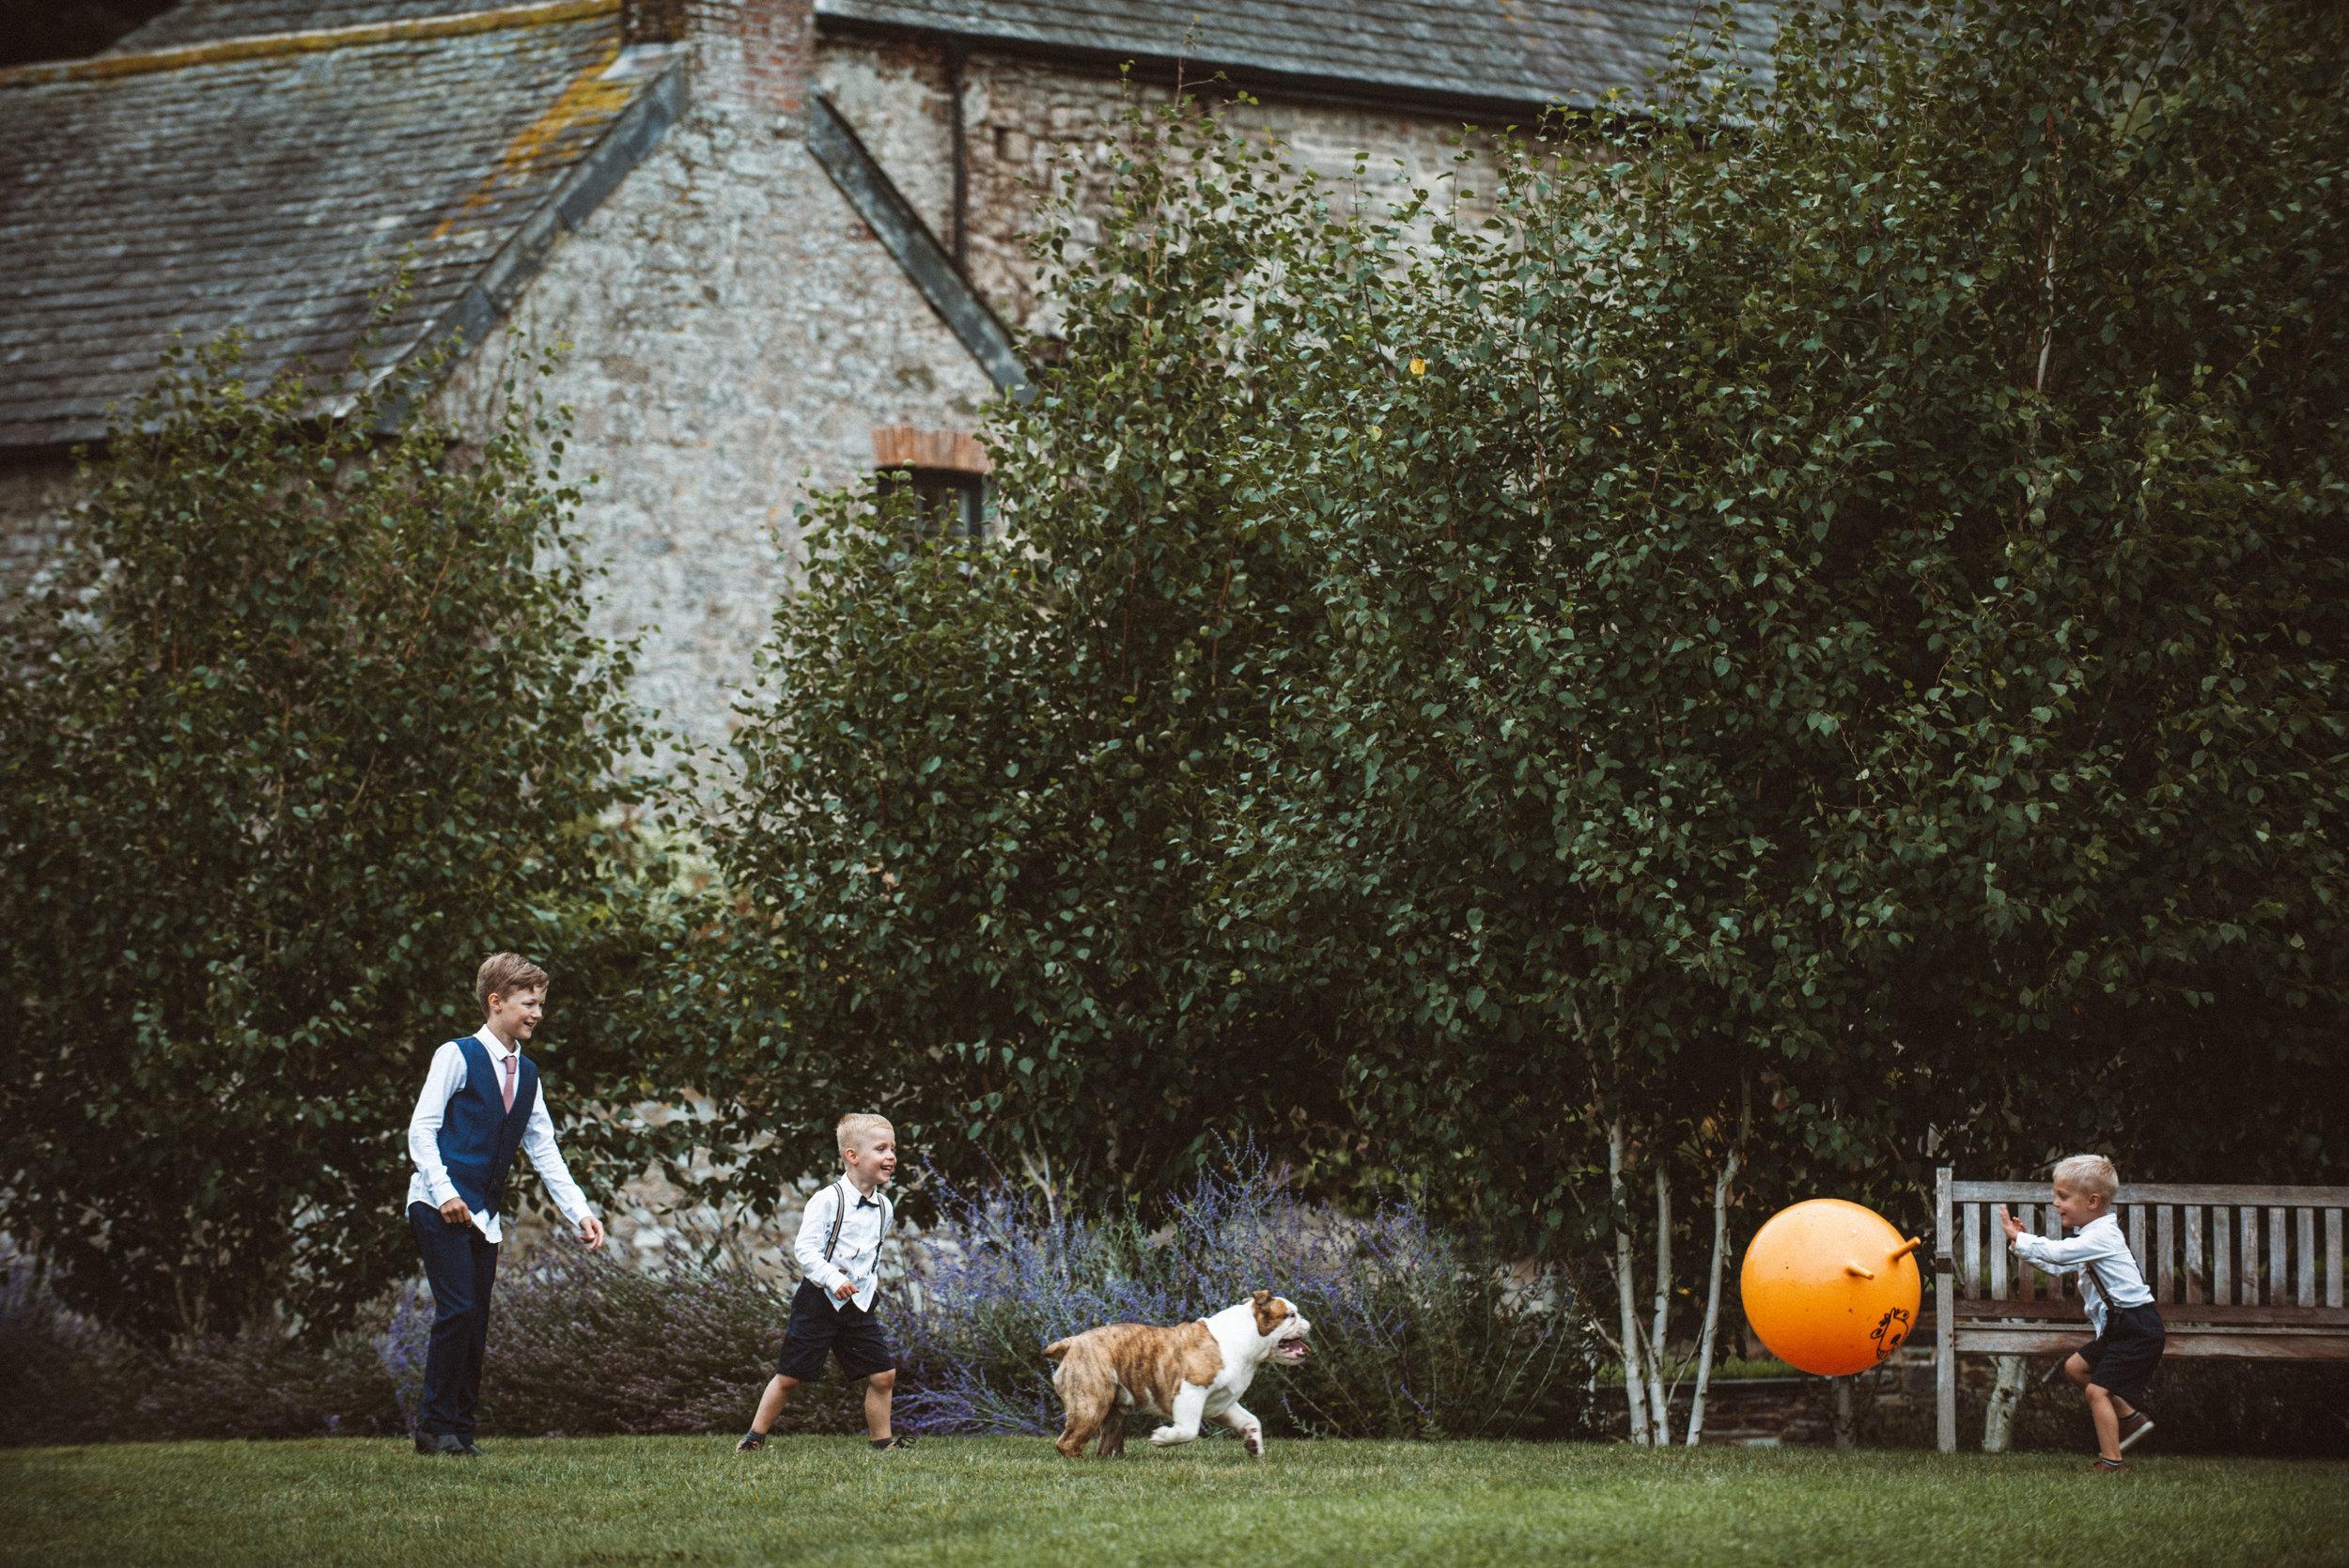 pengenna-manor-wedding-photographer-63.jpg